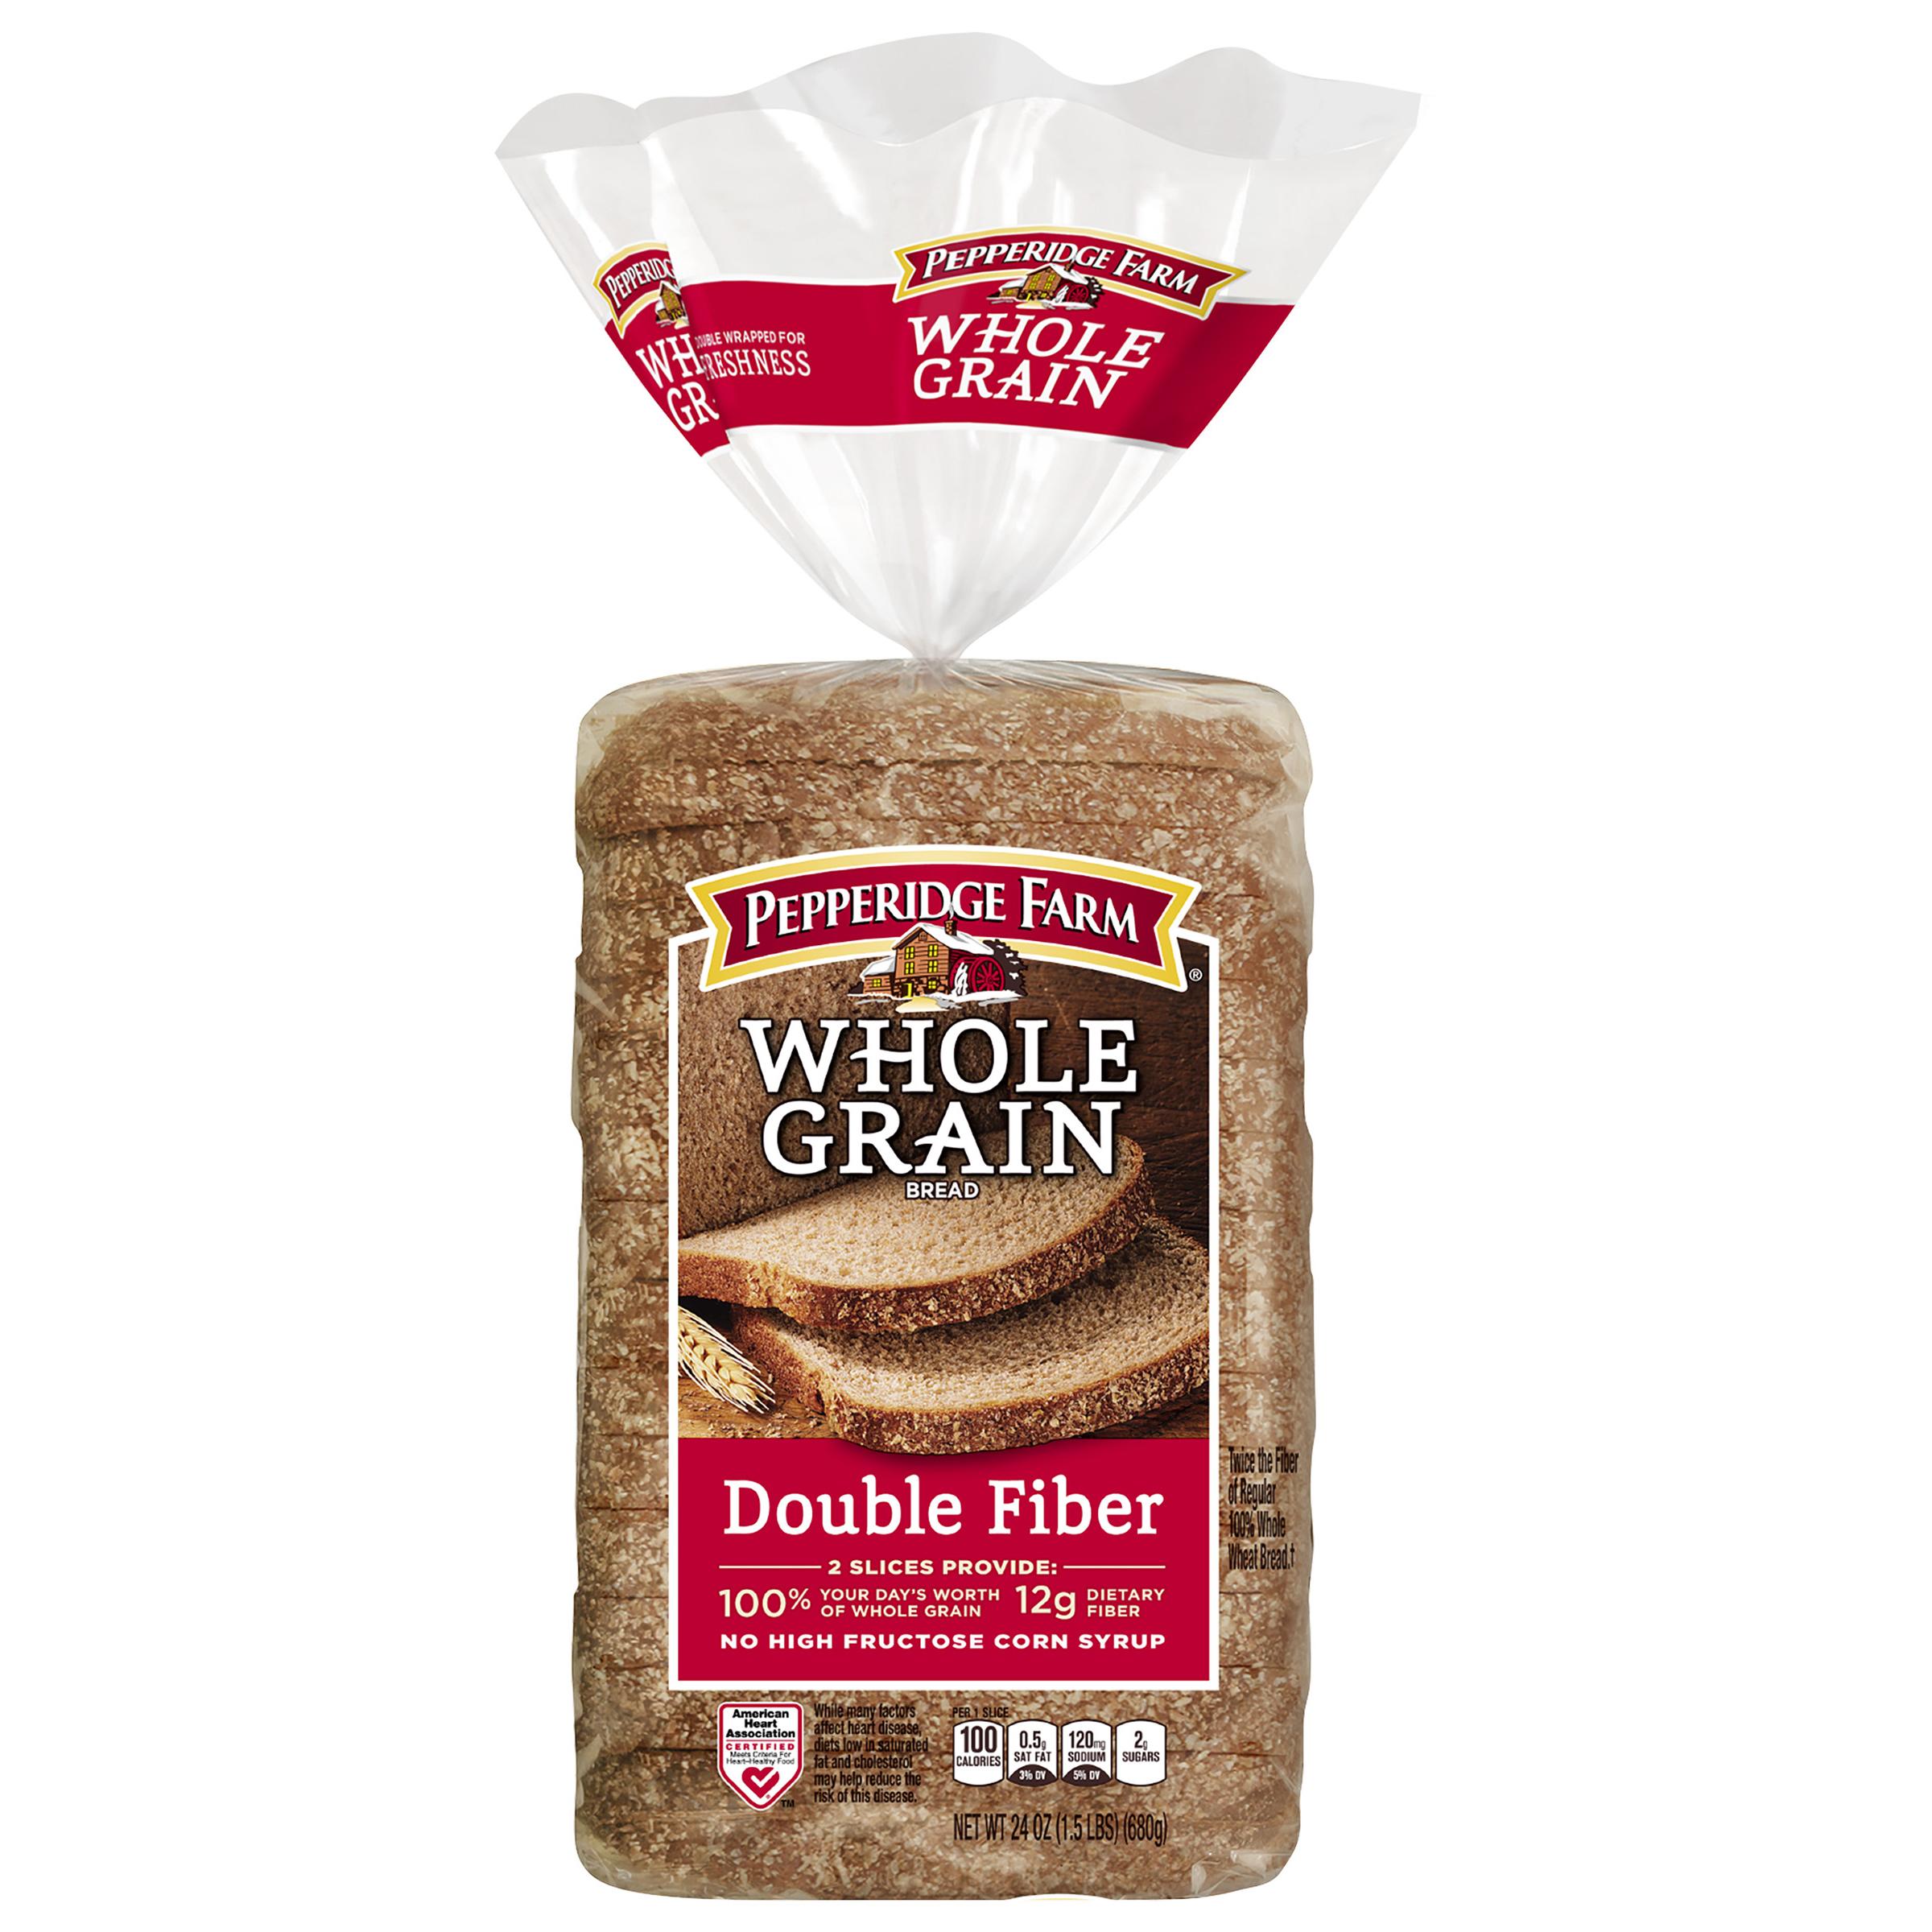 Pepperidge Farm® Whole Grain Double Fiber Bread 24 oz. Bag